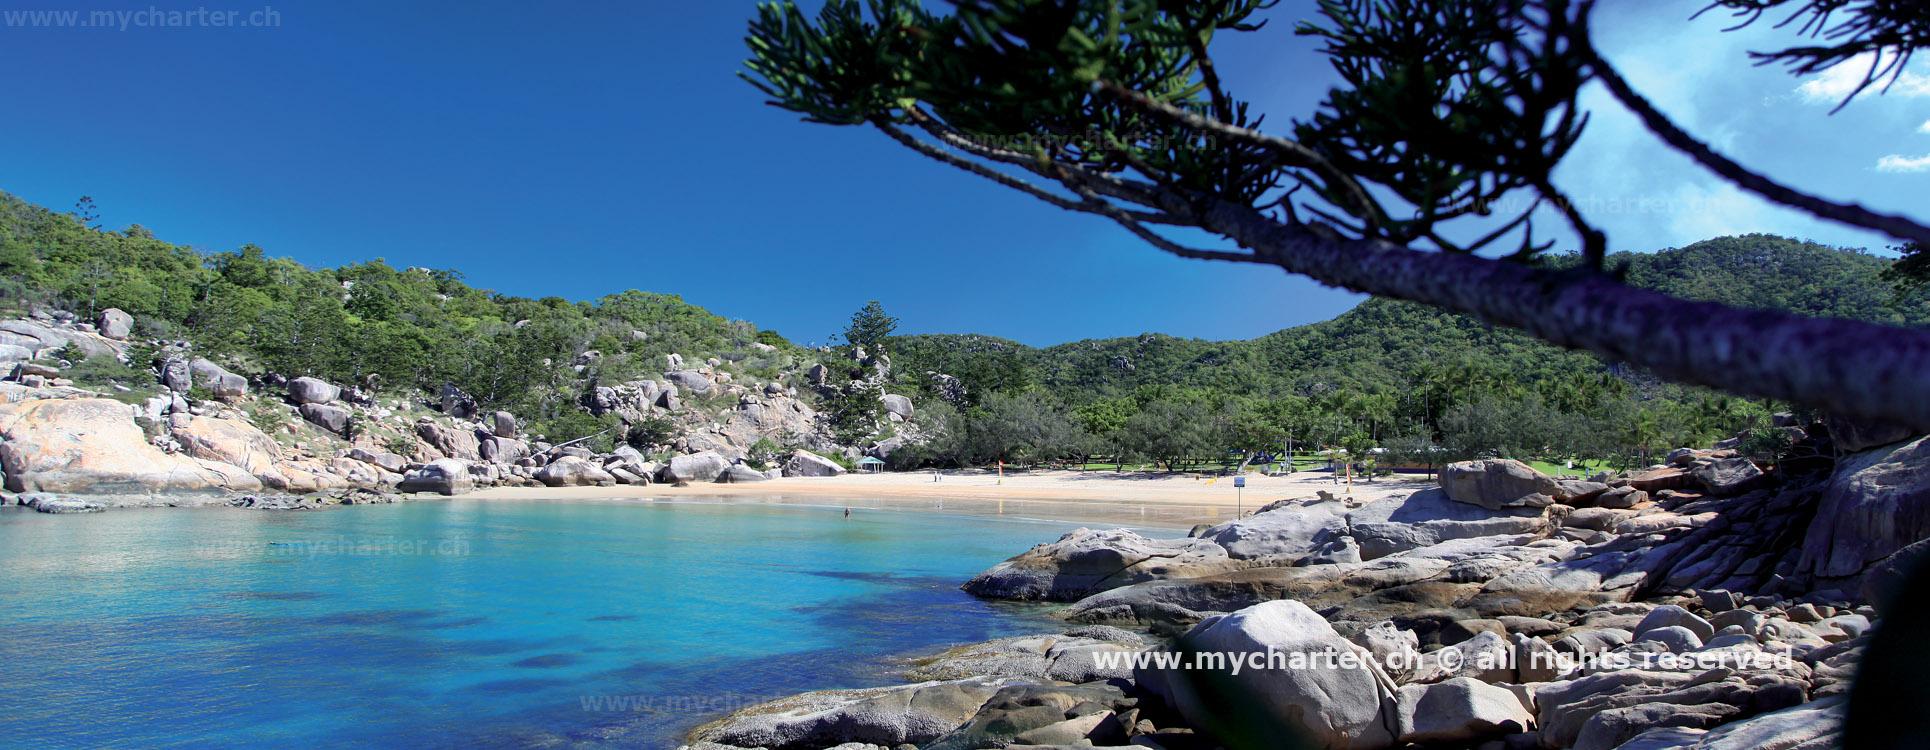 Yachtcharter Australien - Magnetic Island